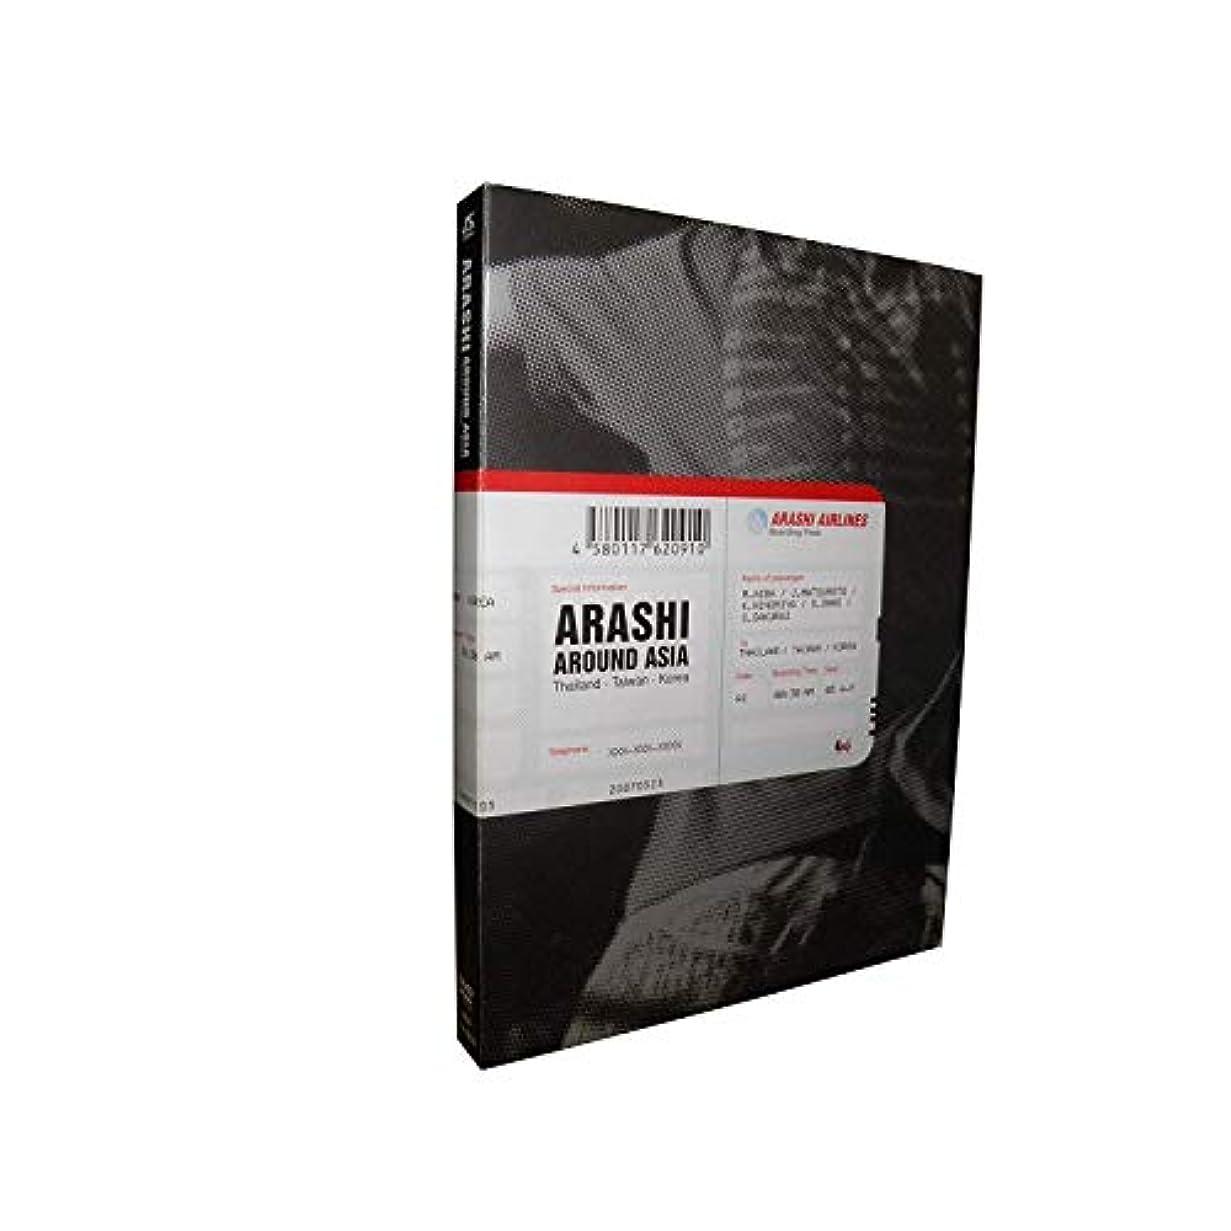 推測する重荷有益ARASHI AROUND ASIA 【初回生産限定盤】 [DVD]